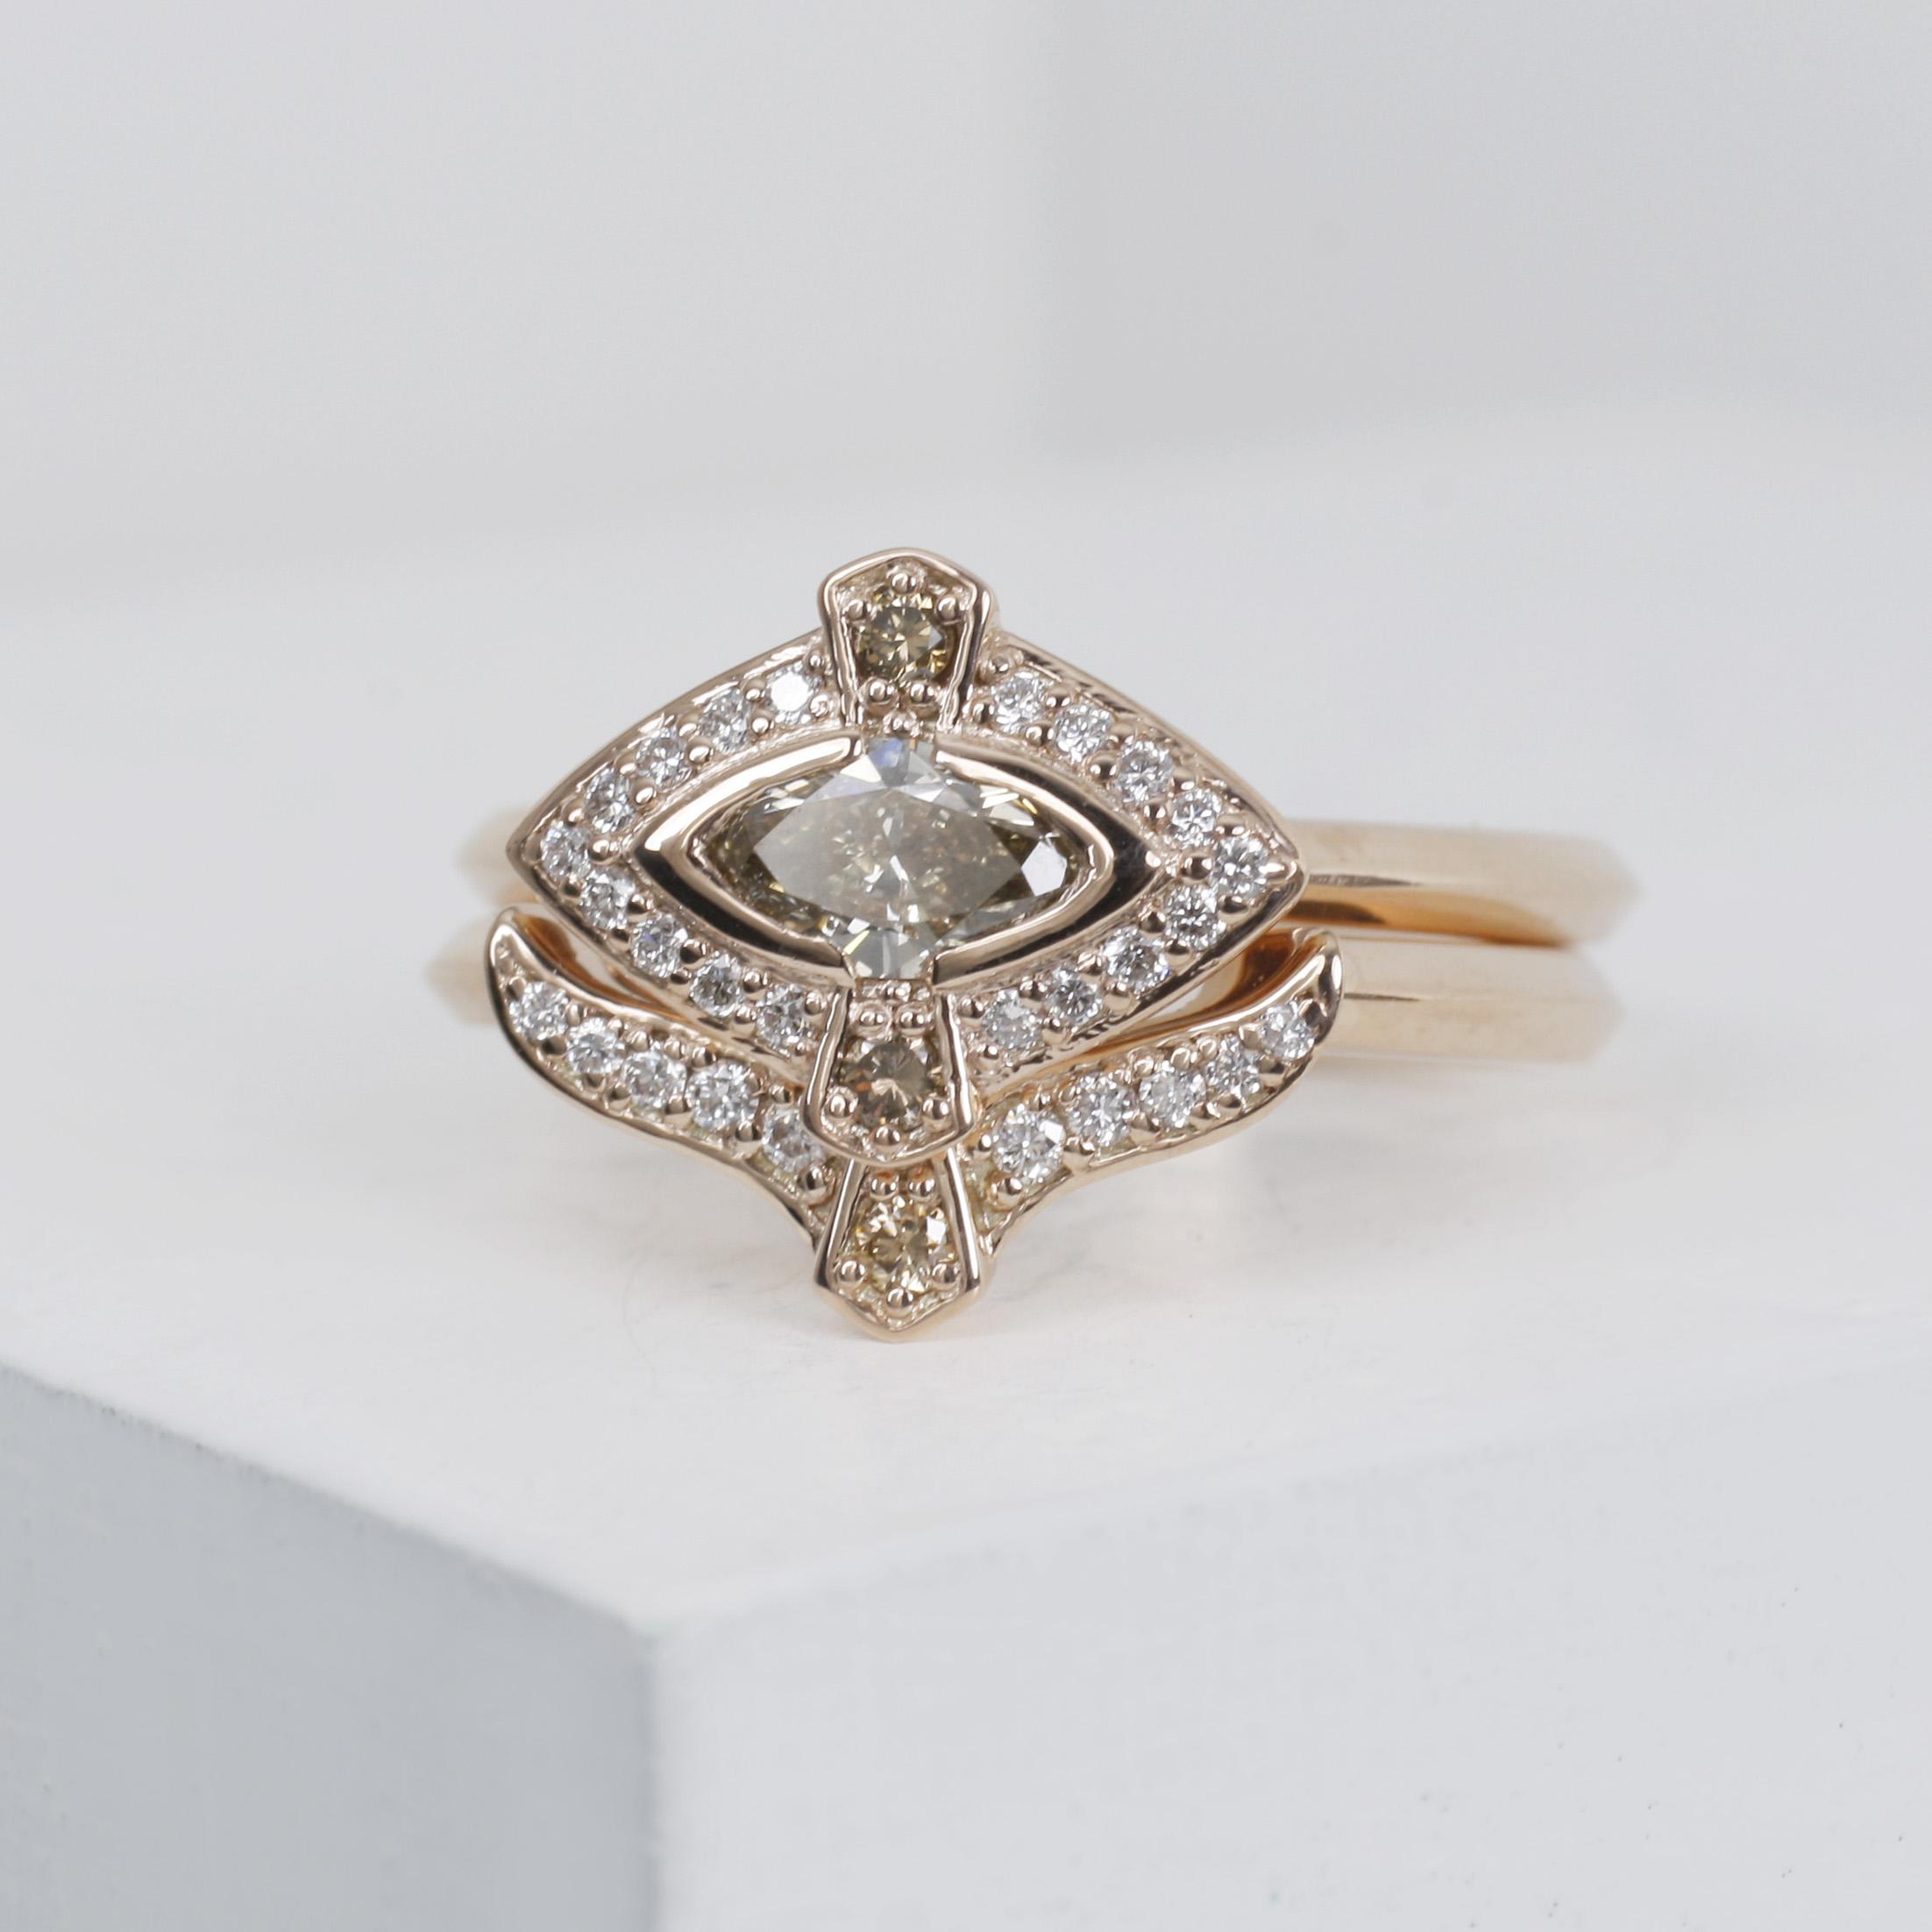 Rose gold, champagne diamond and white diamond wedding ring set./>               </div>               <div class=